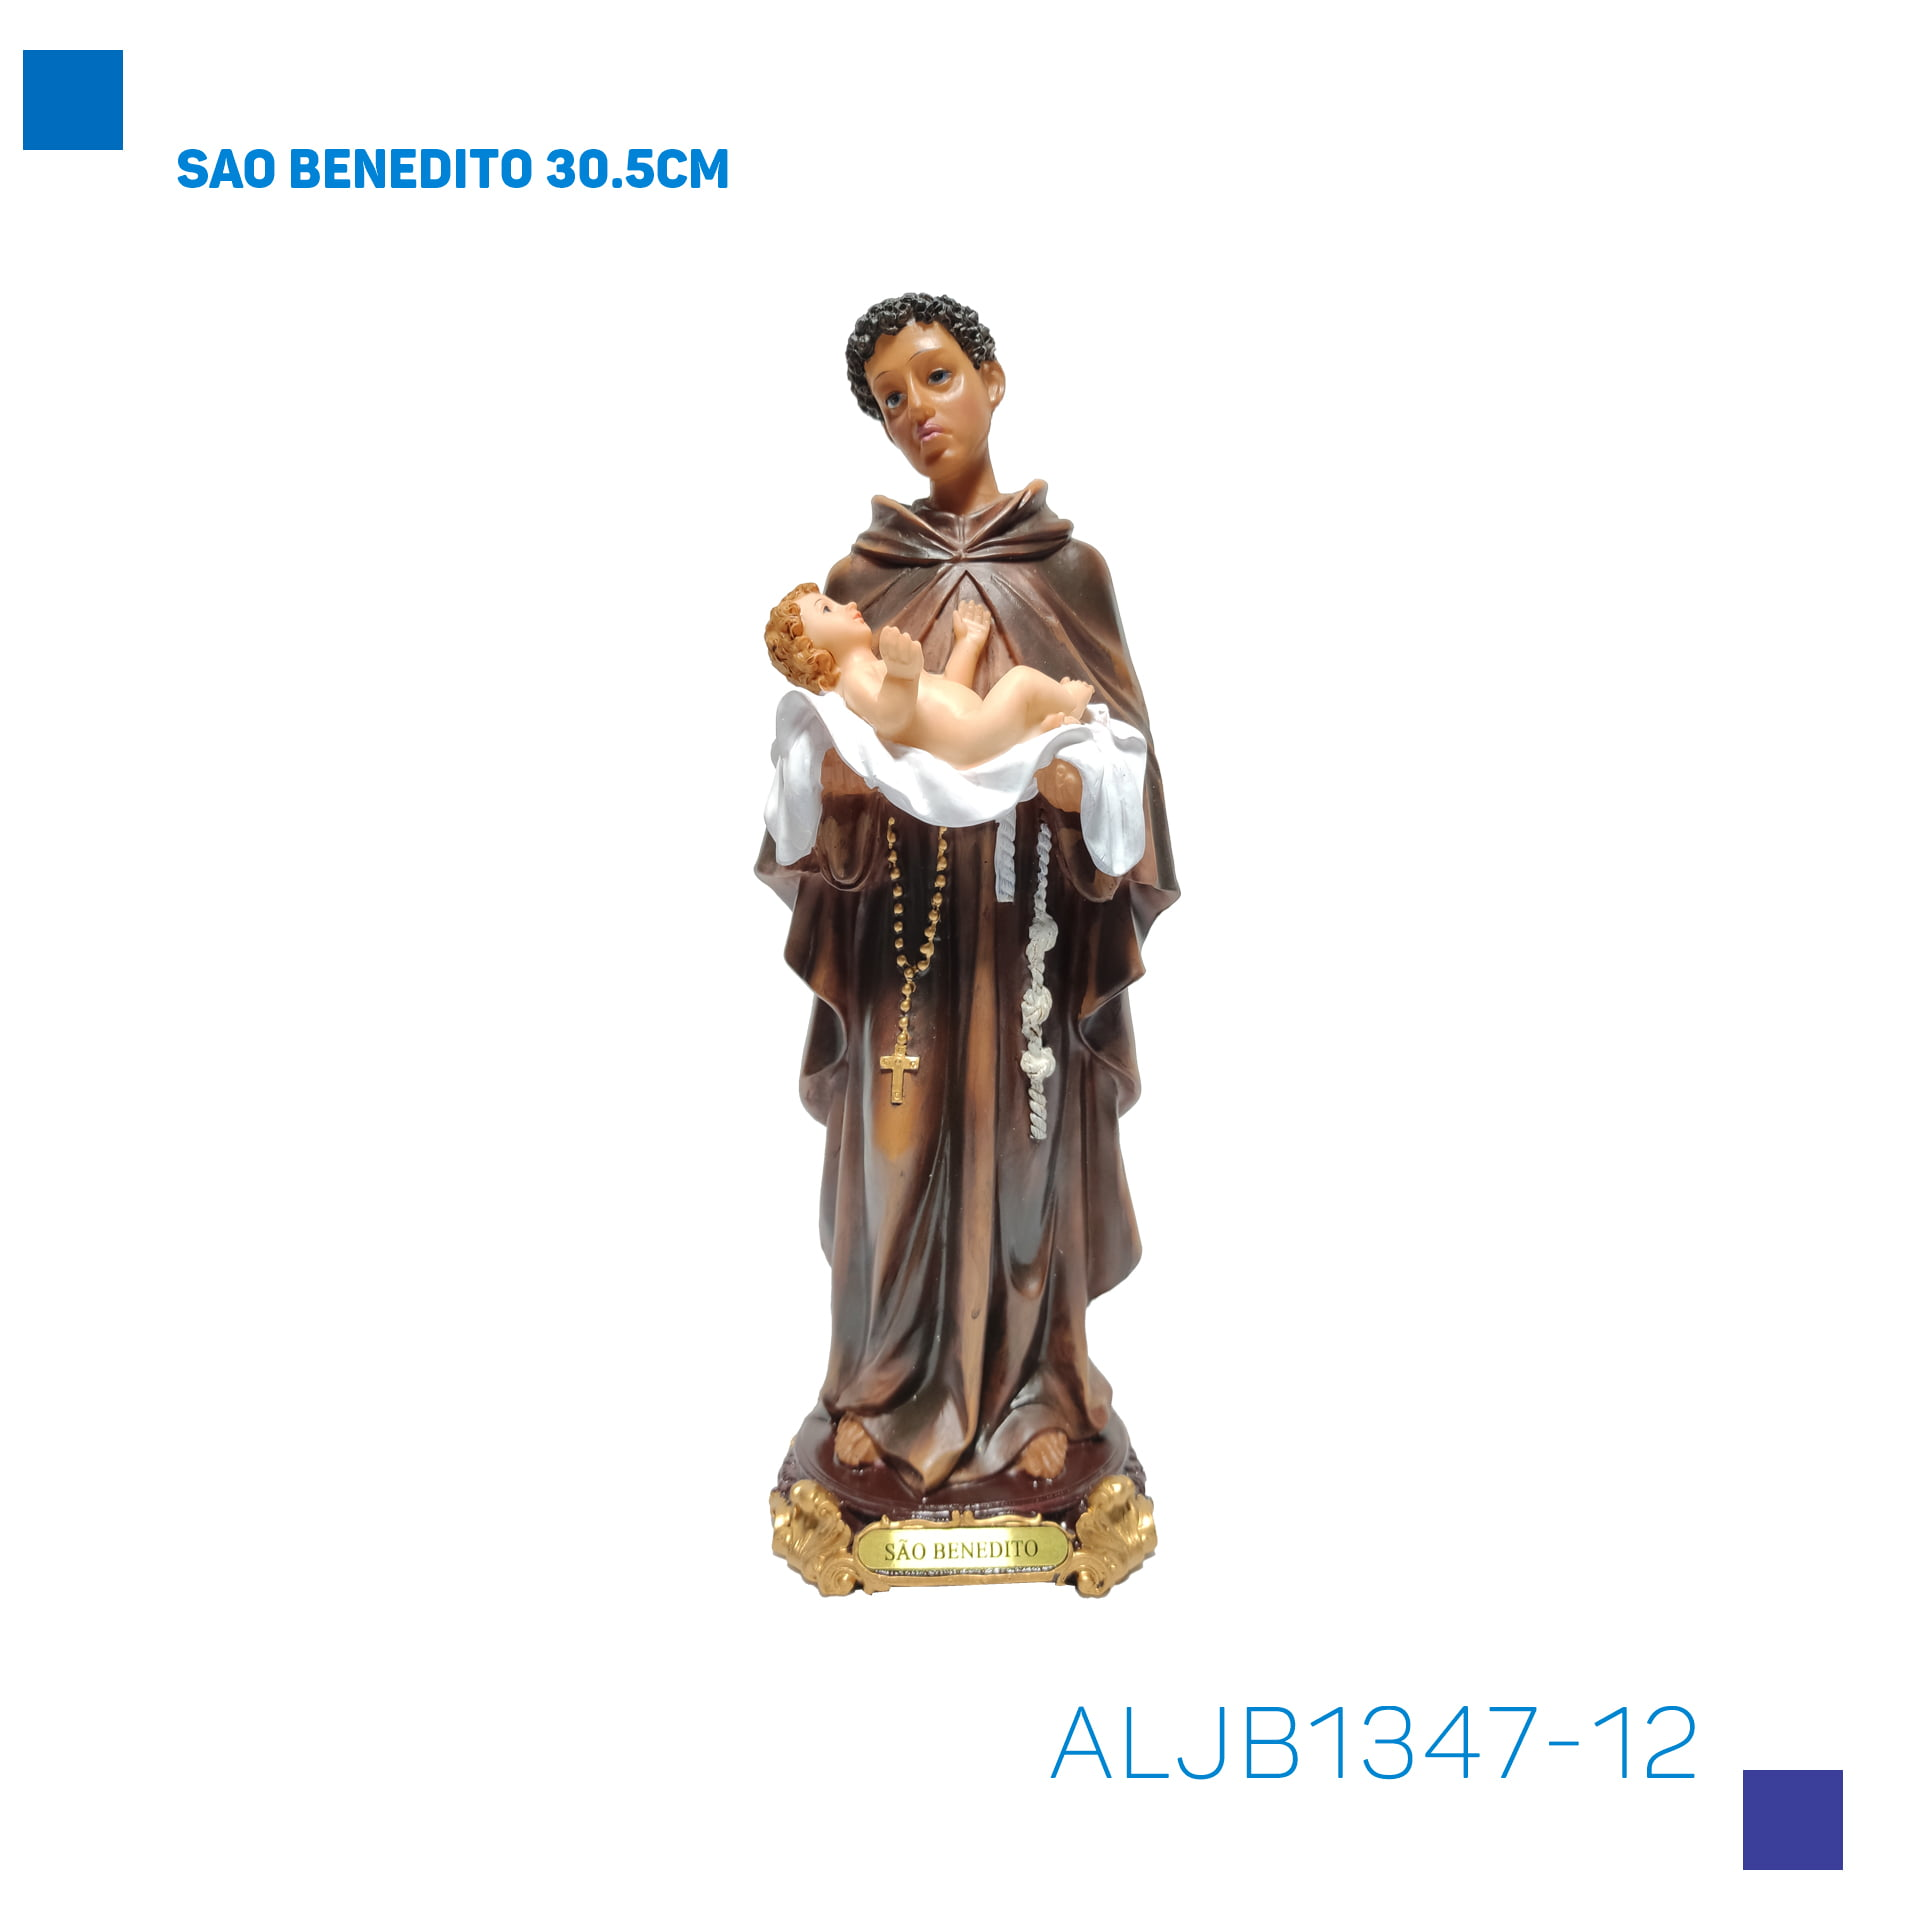 Bira Artigos Religiosos - SAO BENEDITO 30.5CM - Cód . ALJB1347-12